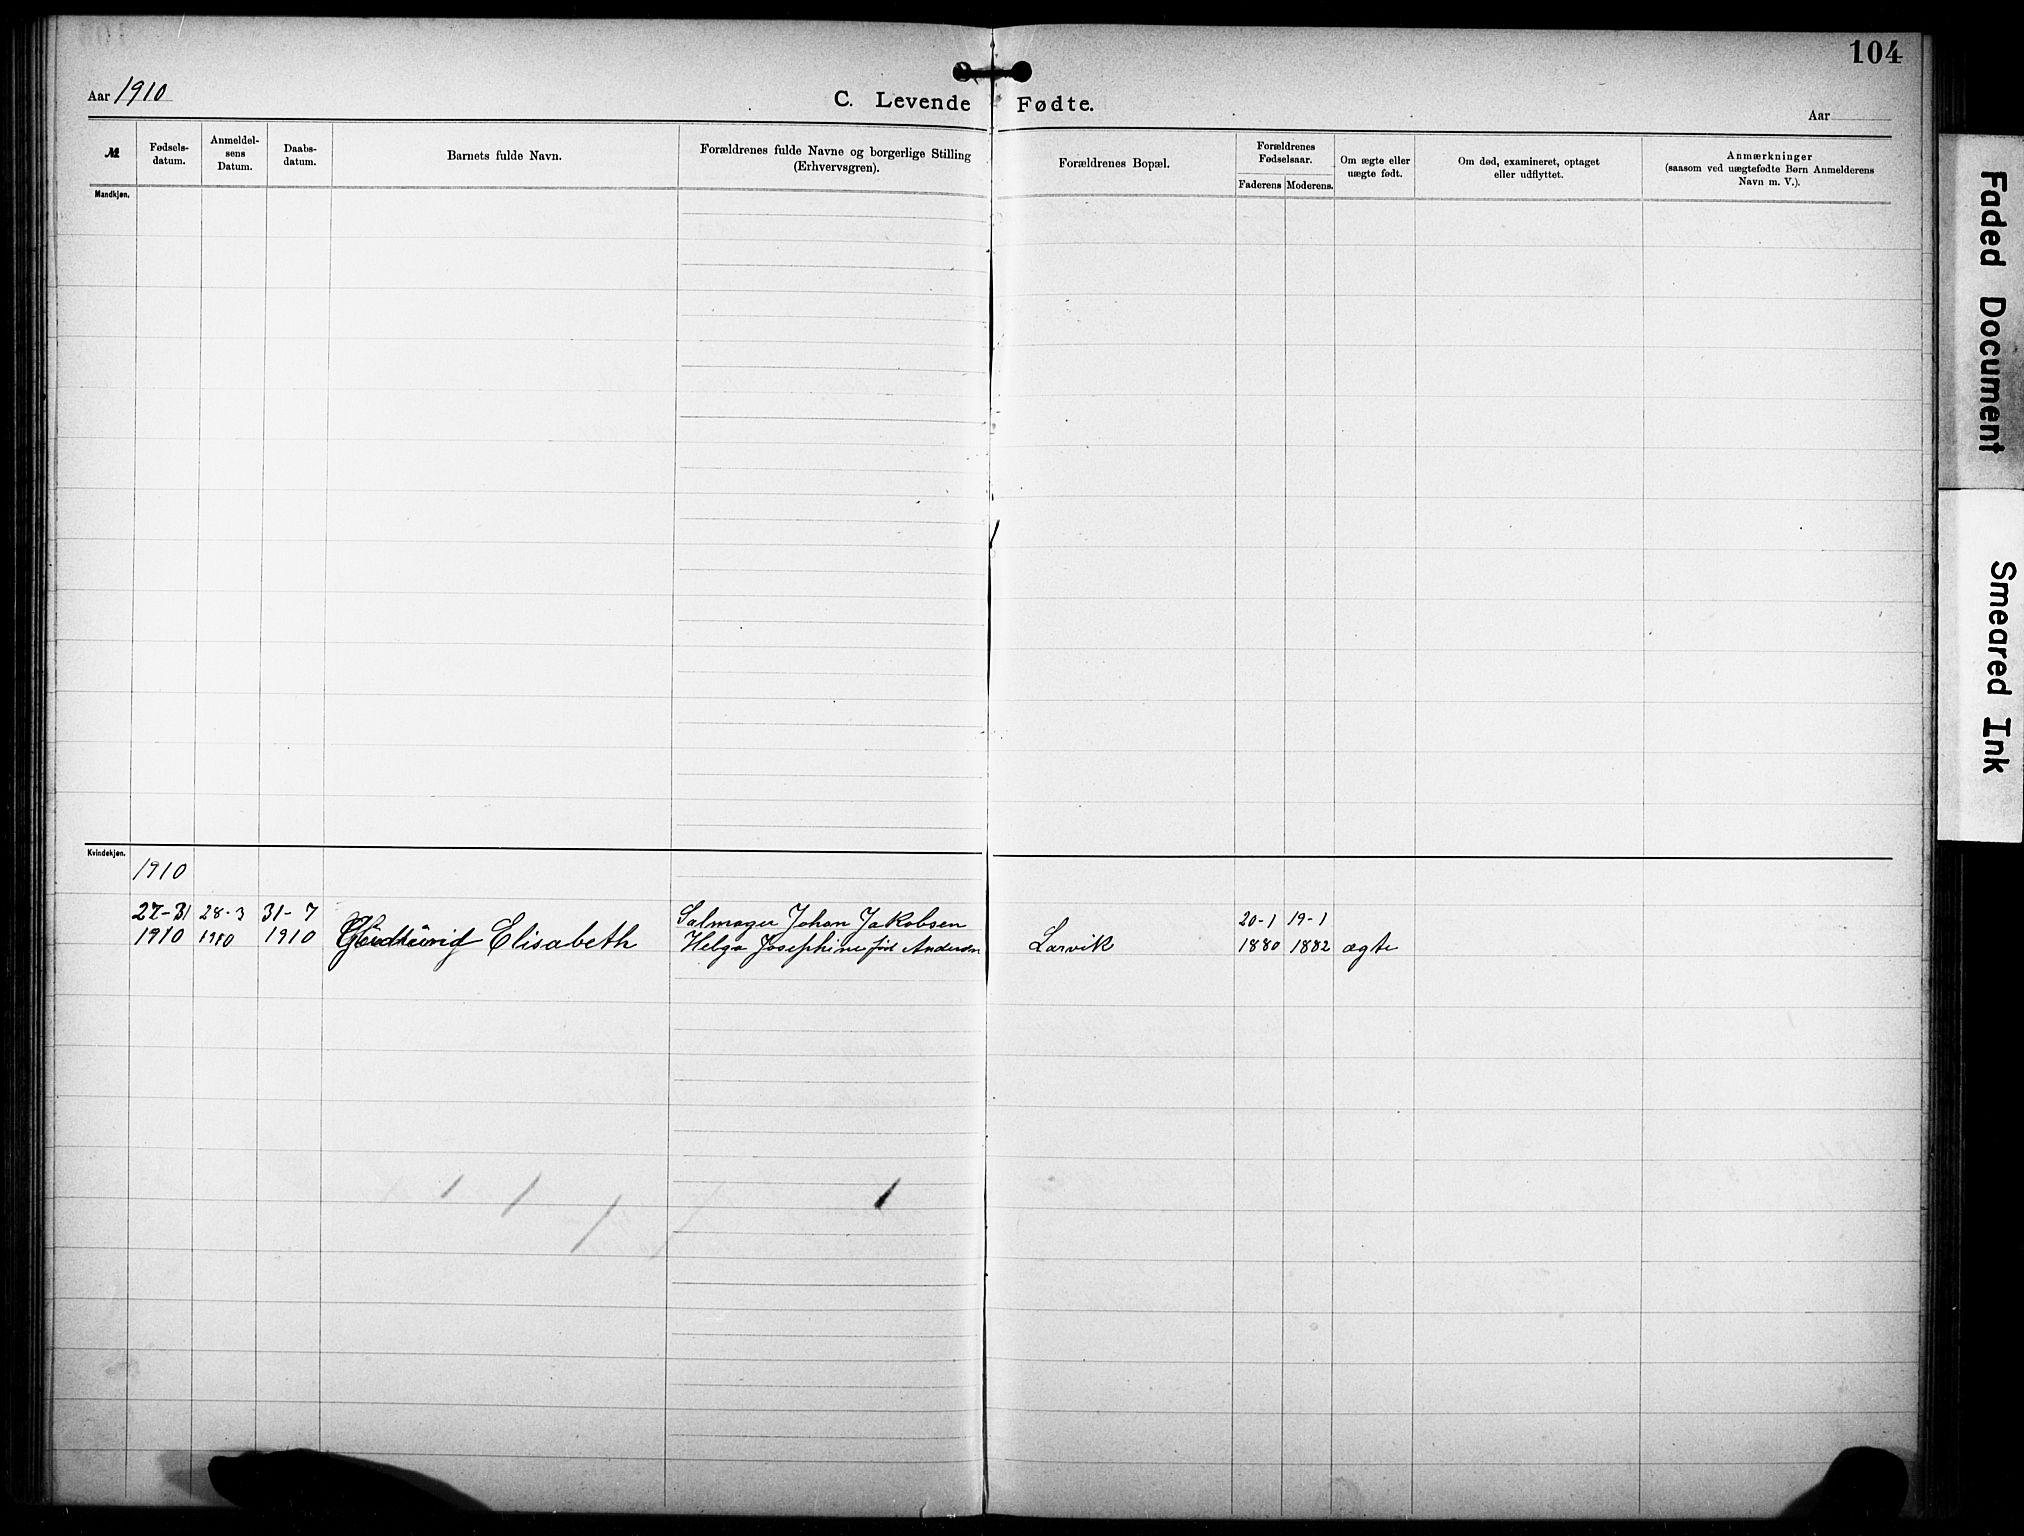 SAKO, Den katolsk-apostoliske menighet i Larvik, F/Fa/L0001: Dissenter register no. 1, 1892-1933, p. 104